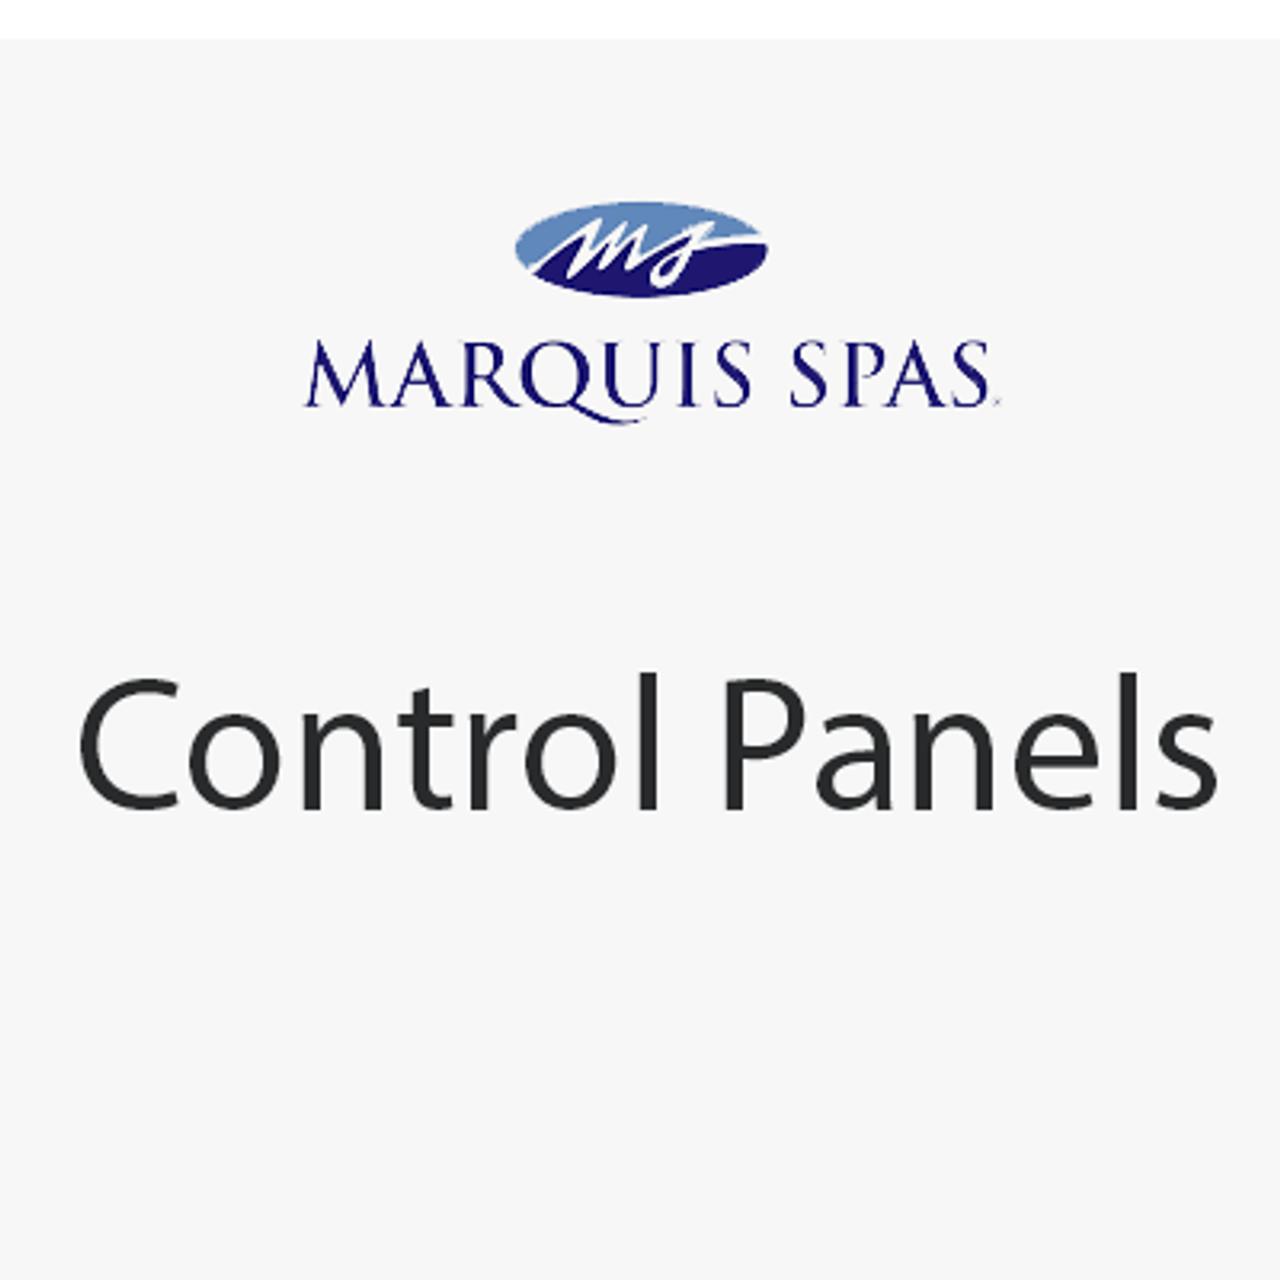 Marquis Spa Control Panels